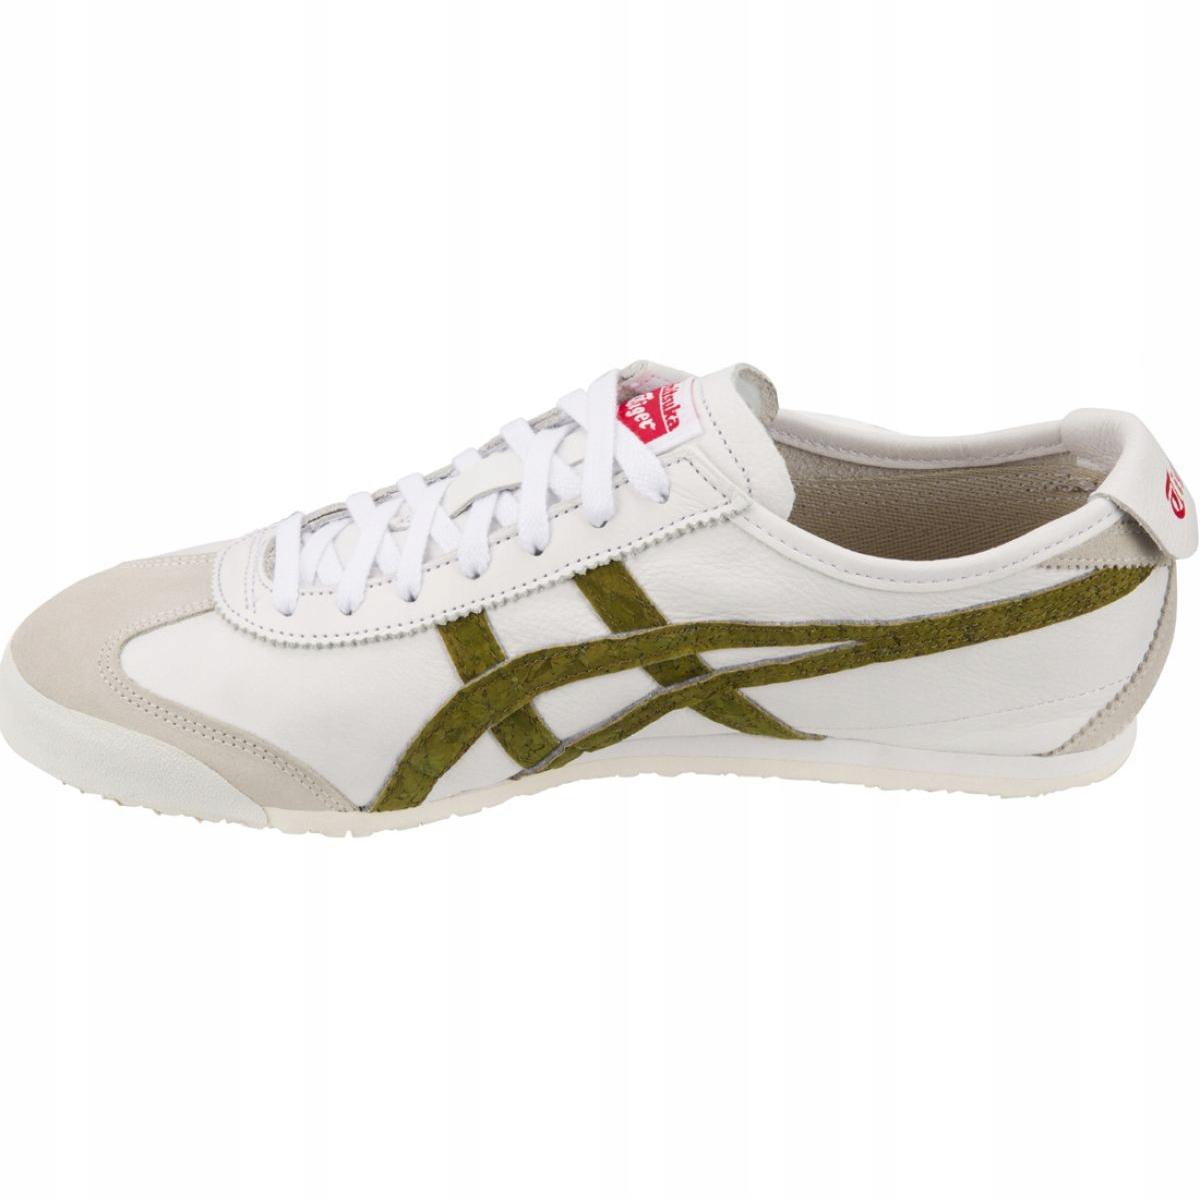 onitsuka tiger mexico 66 shoes online oficial nueva ubicacion